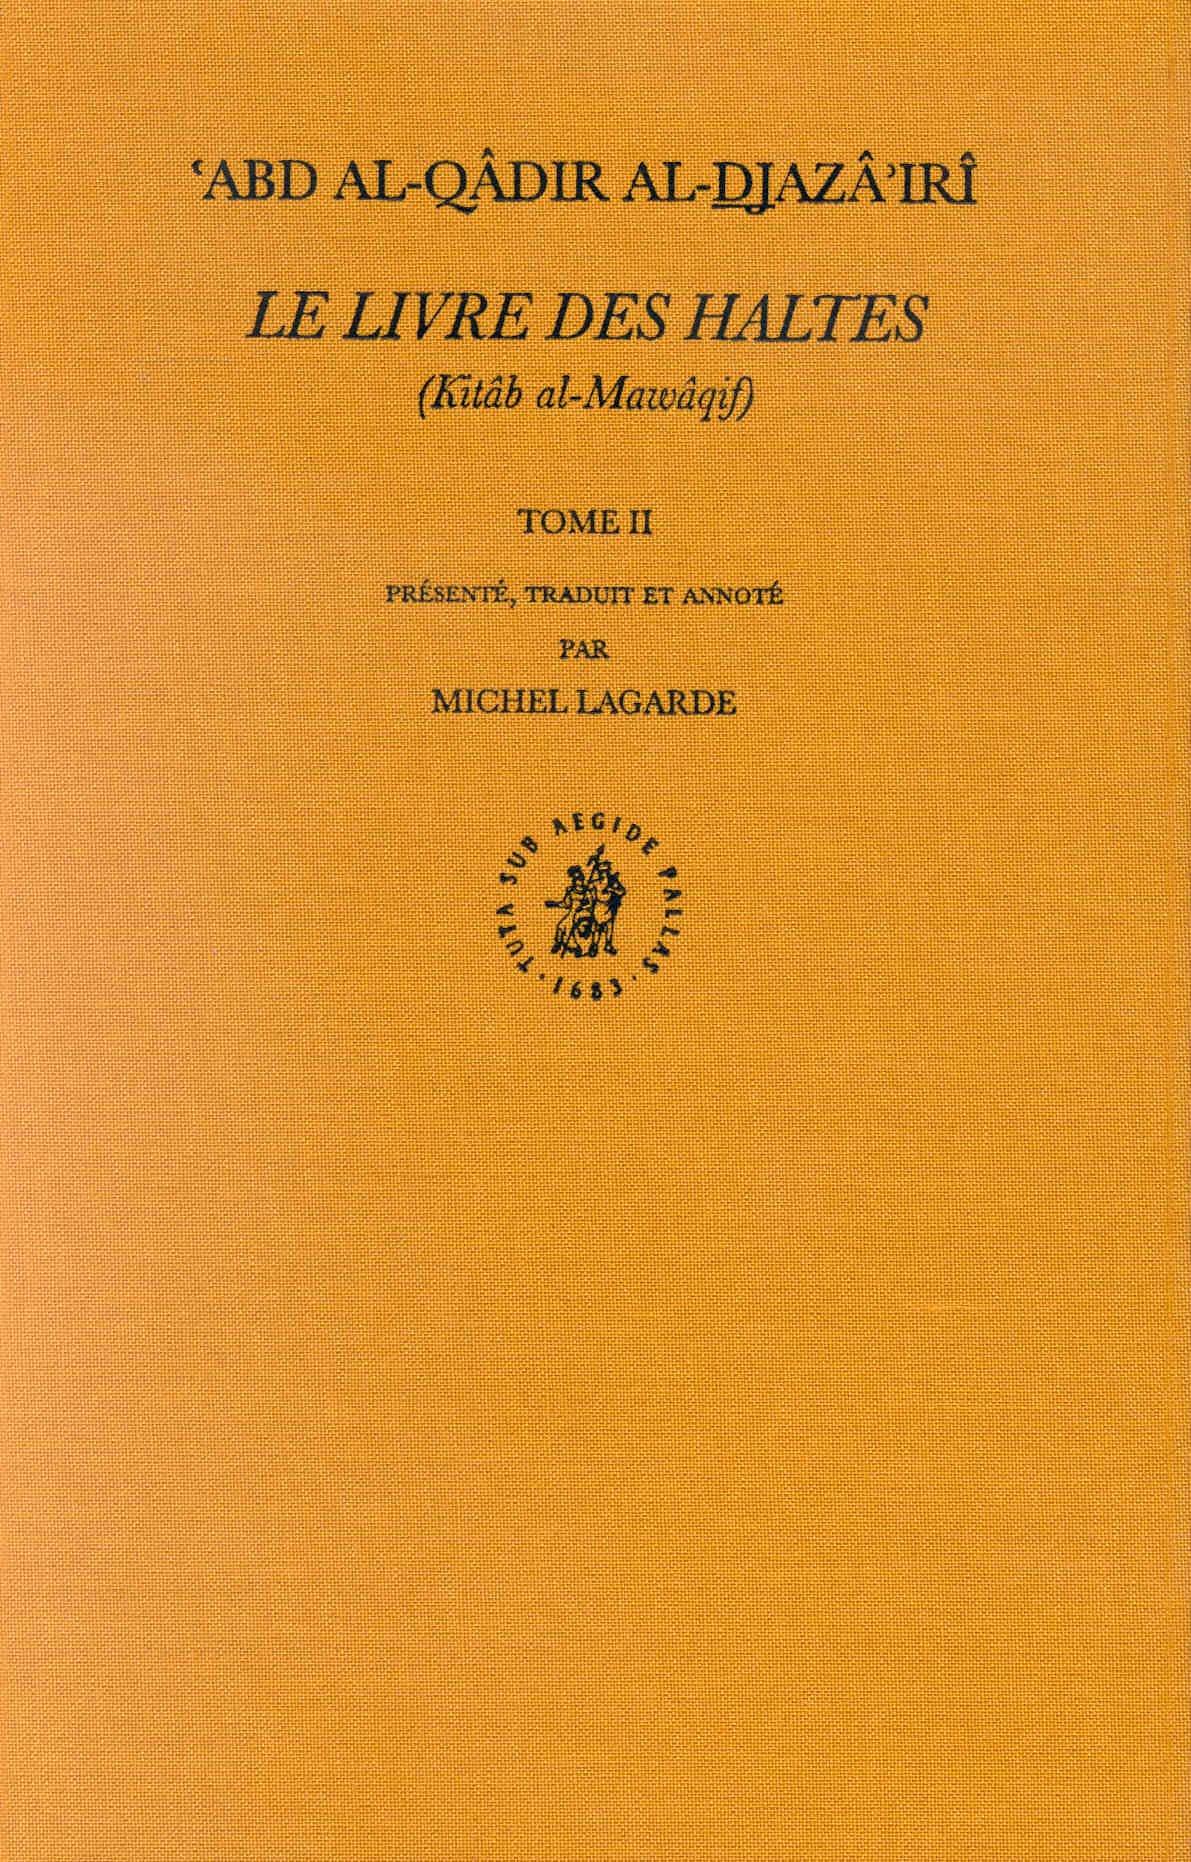 Download Le Livre Des Haltes (Kitâb Al-Mawâqif), Tome II (French Edition) ebook